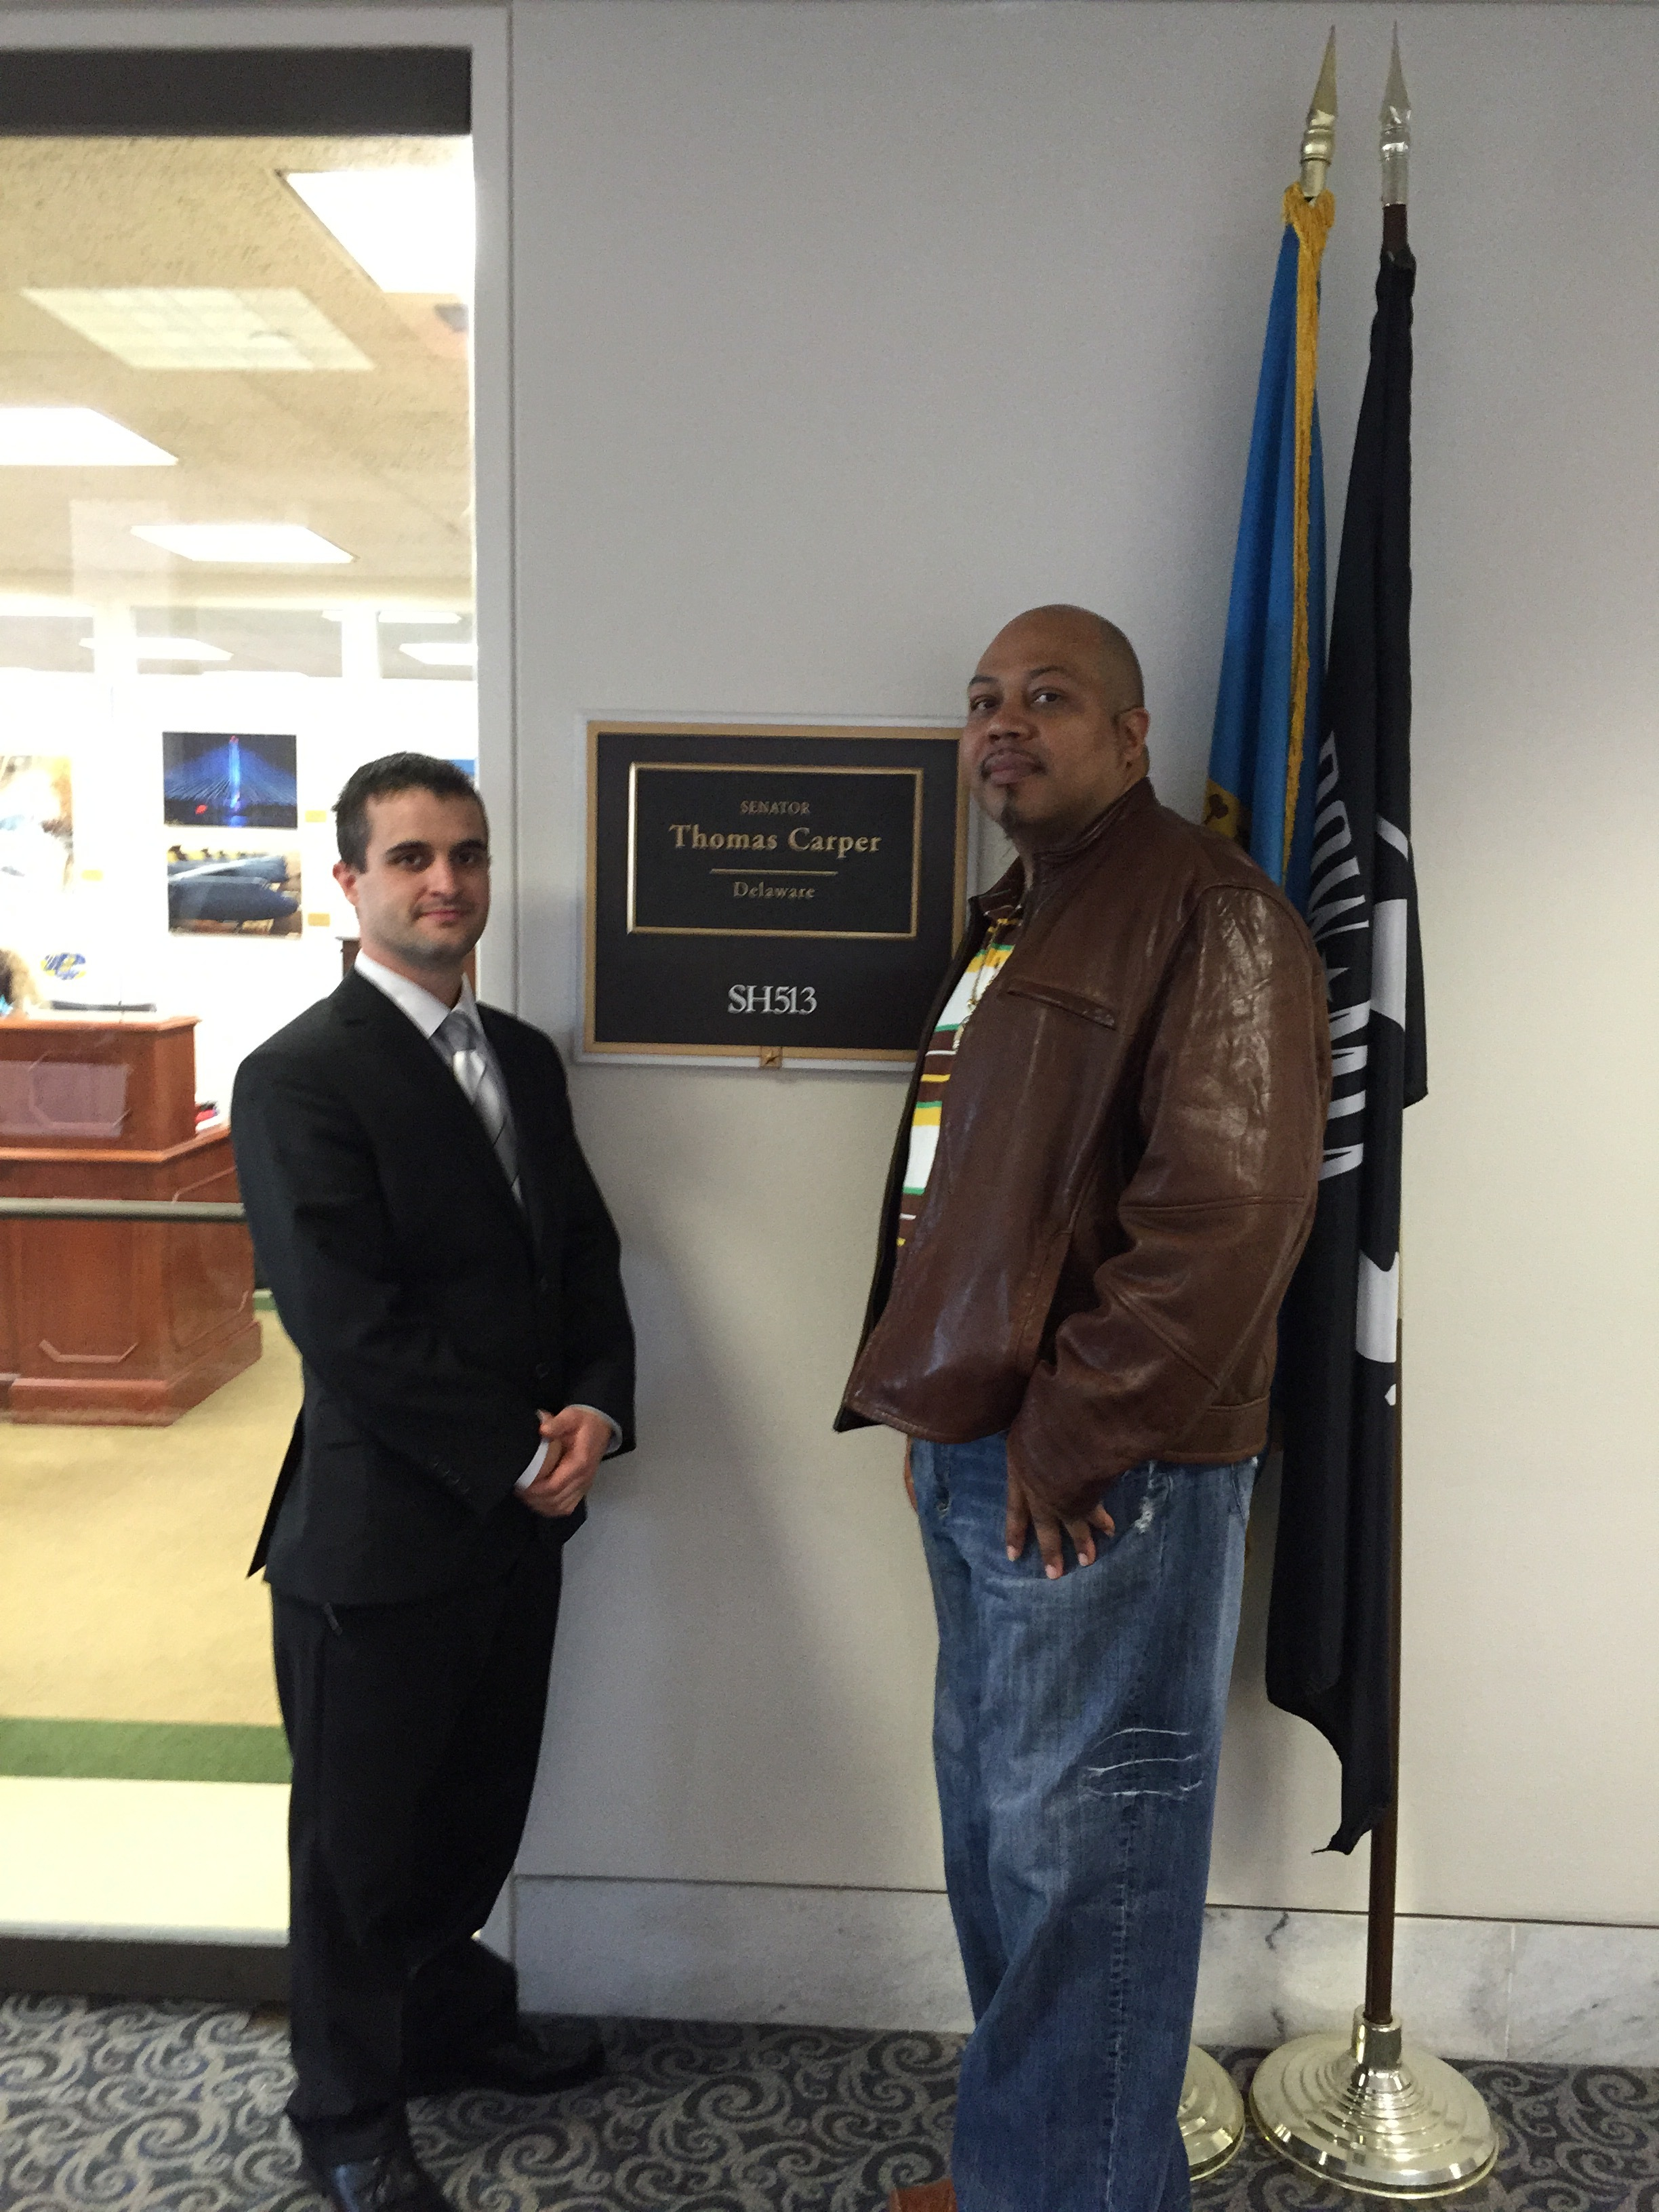 Veterans visit the U.S. senate to tell their stories.